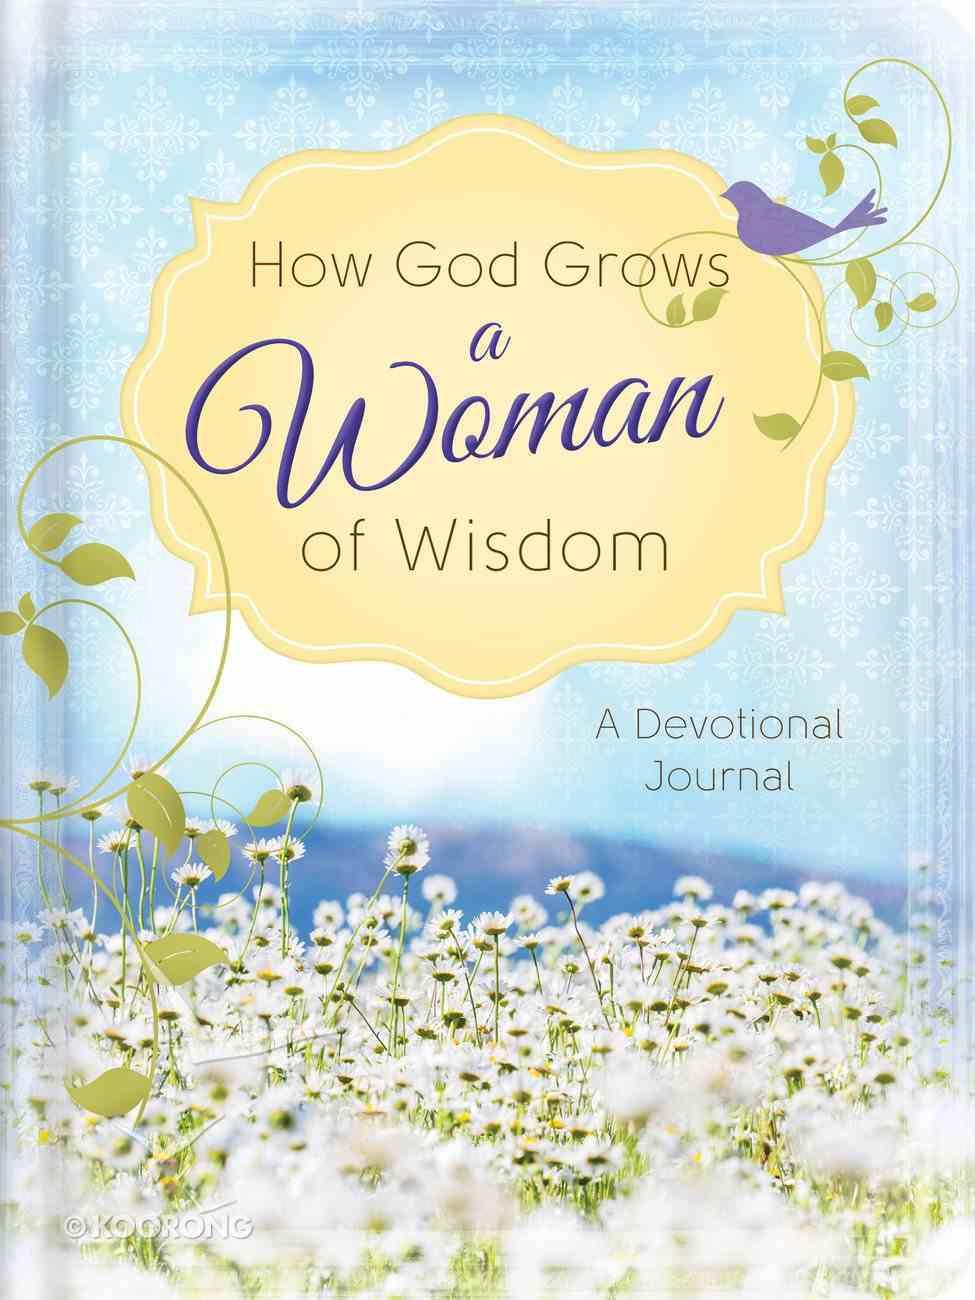 How God Grows a Woman of Wisdom eBook